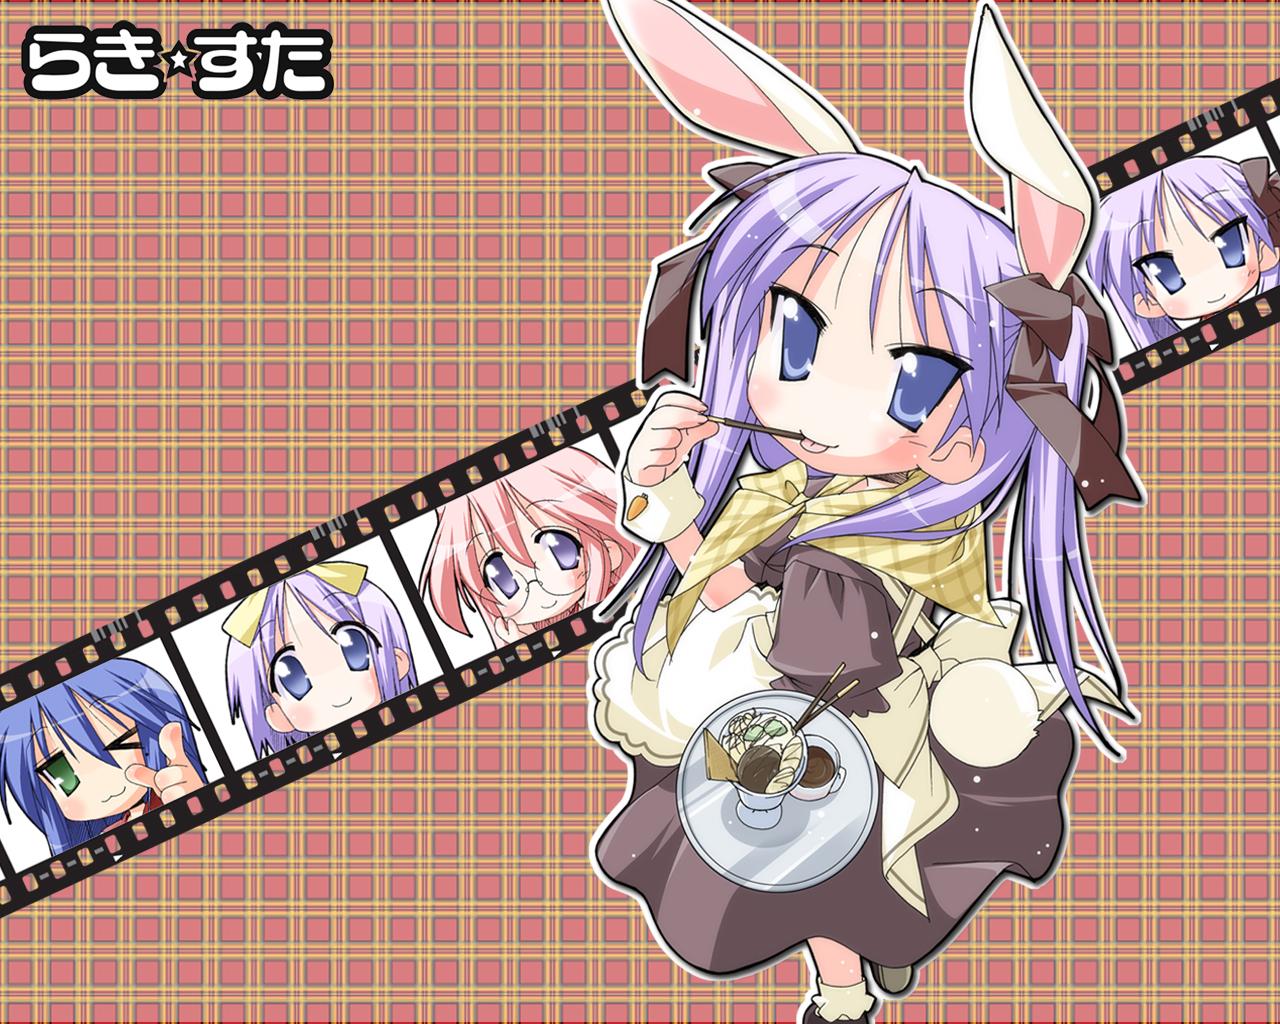 animal_ears bunny_ears bunnygirl cosplay food hiiragi_kagami hiiragi_tsukasa izumi_konata lucky_star pocky takara_miyuki waitress